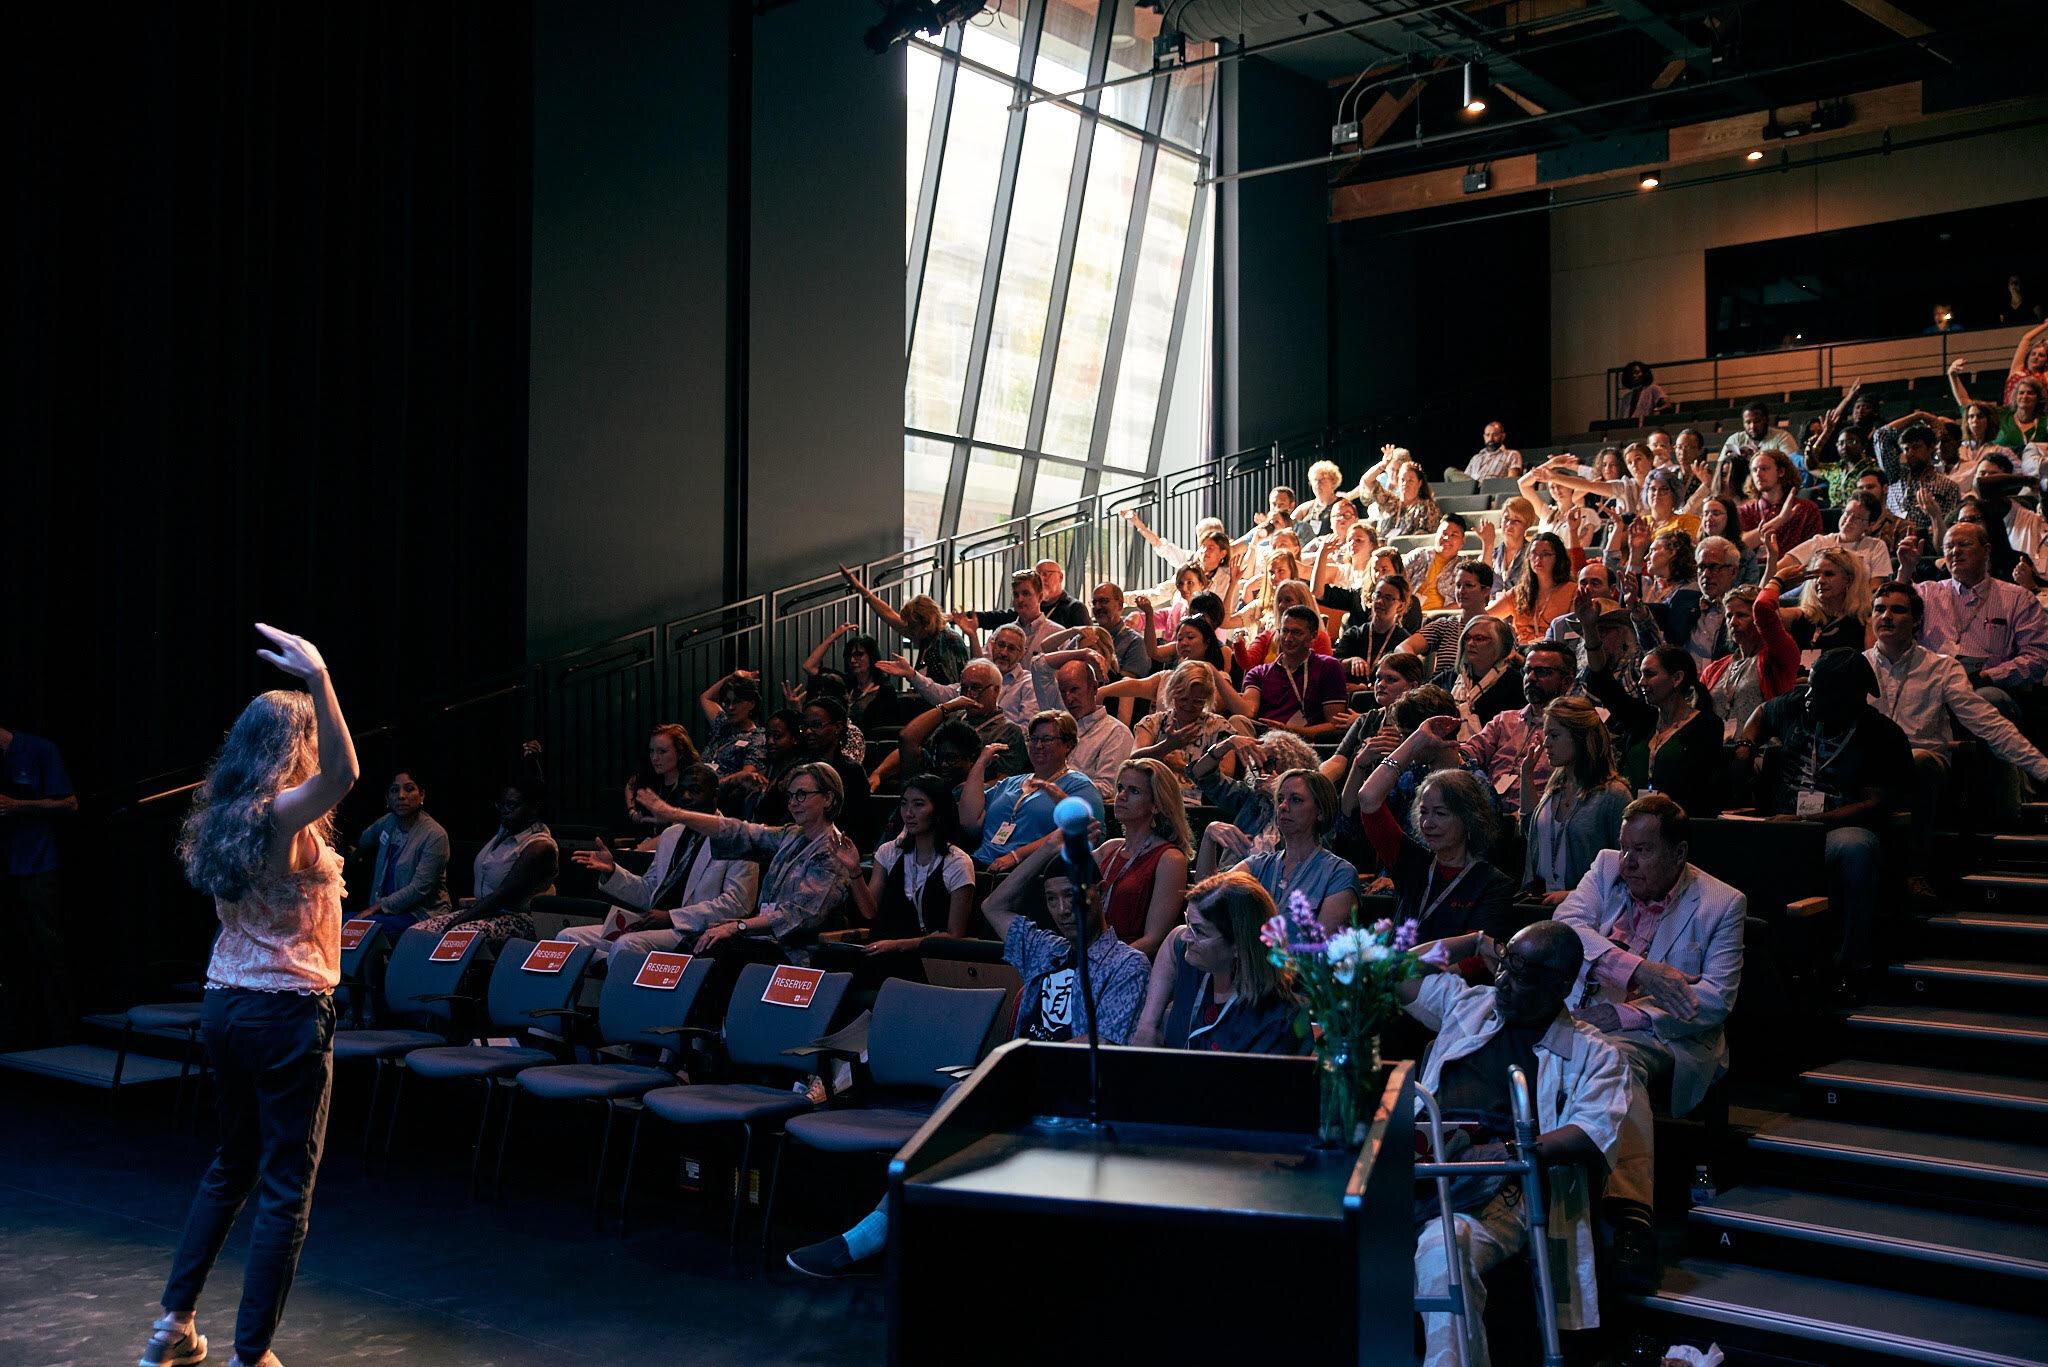 Christina Soriano delivering  pecha kucha  address at ARTIVATE: Creative Catalyst Summit (August 2019)